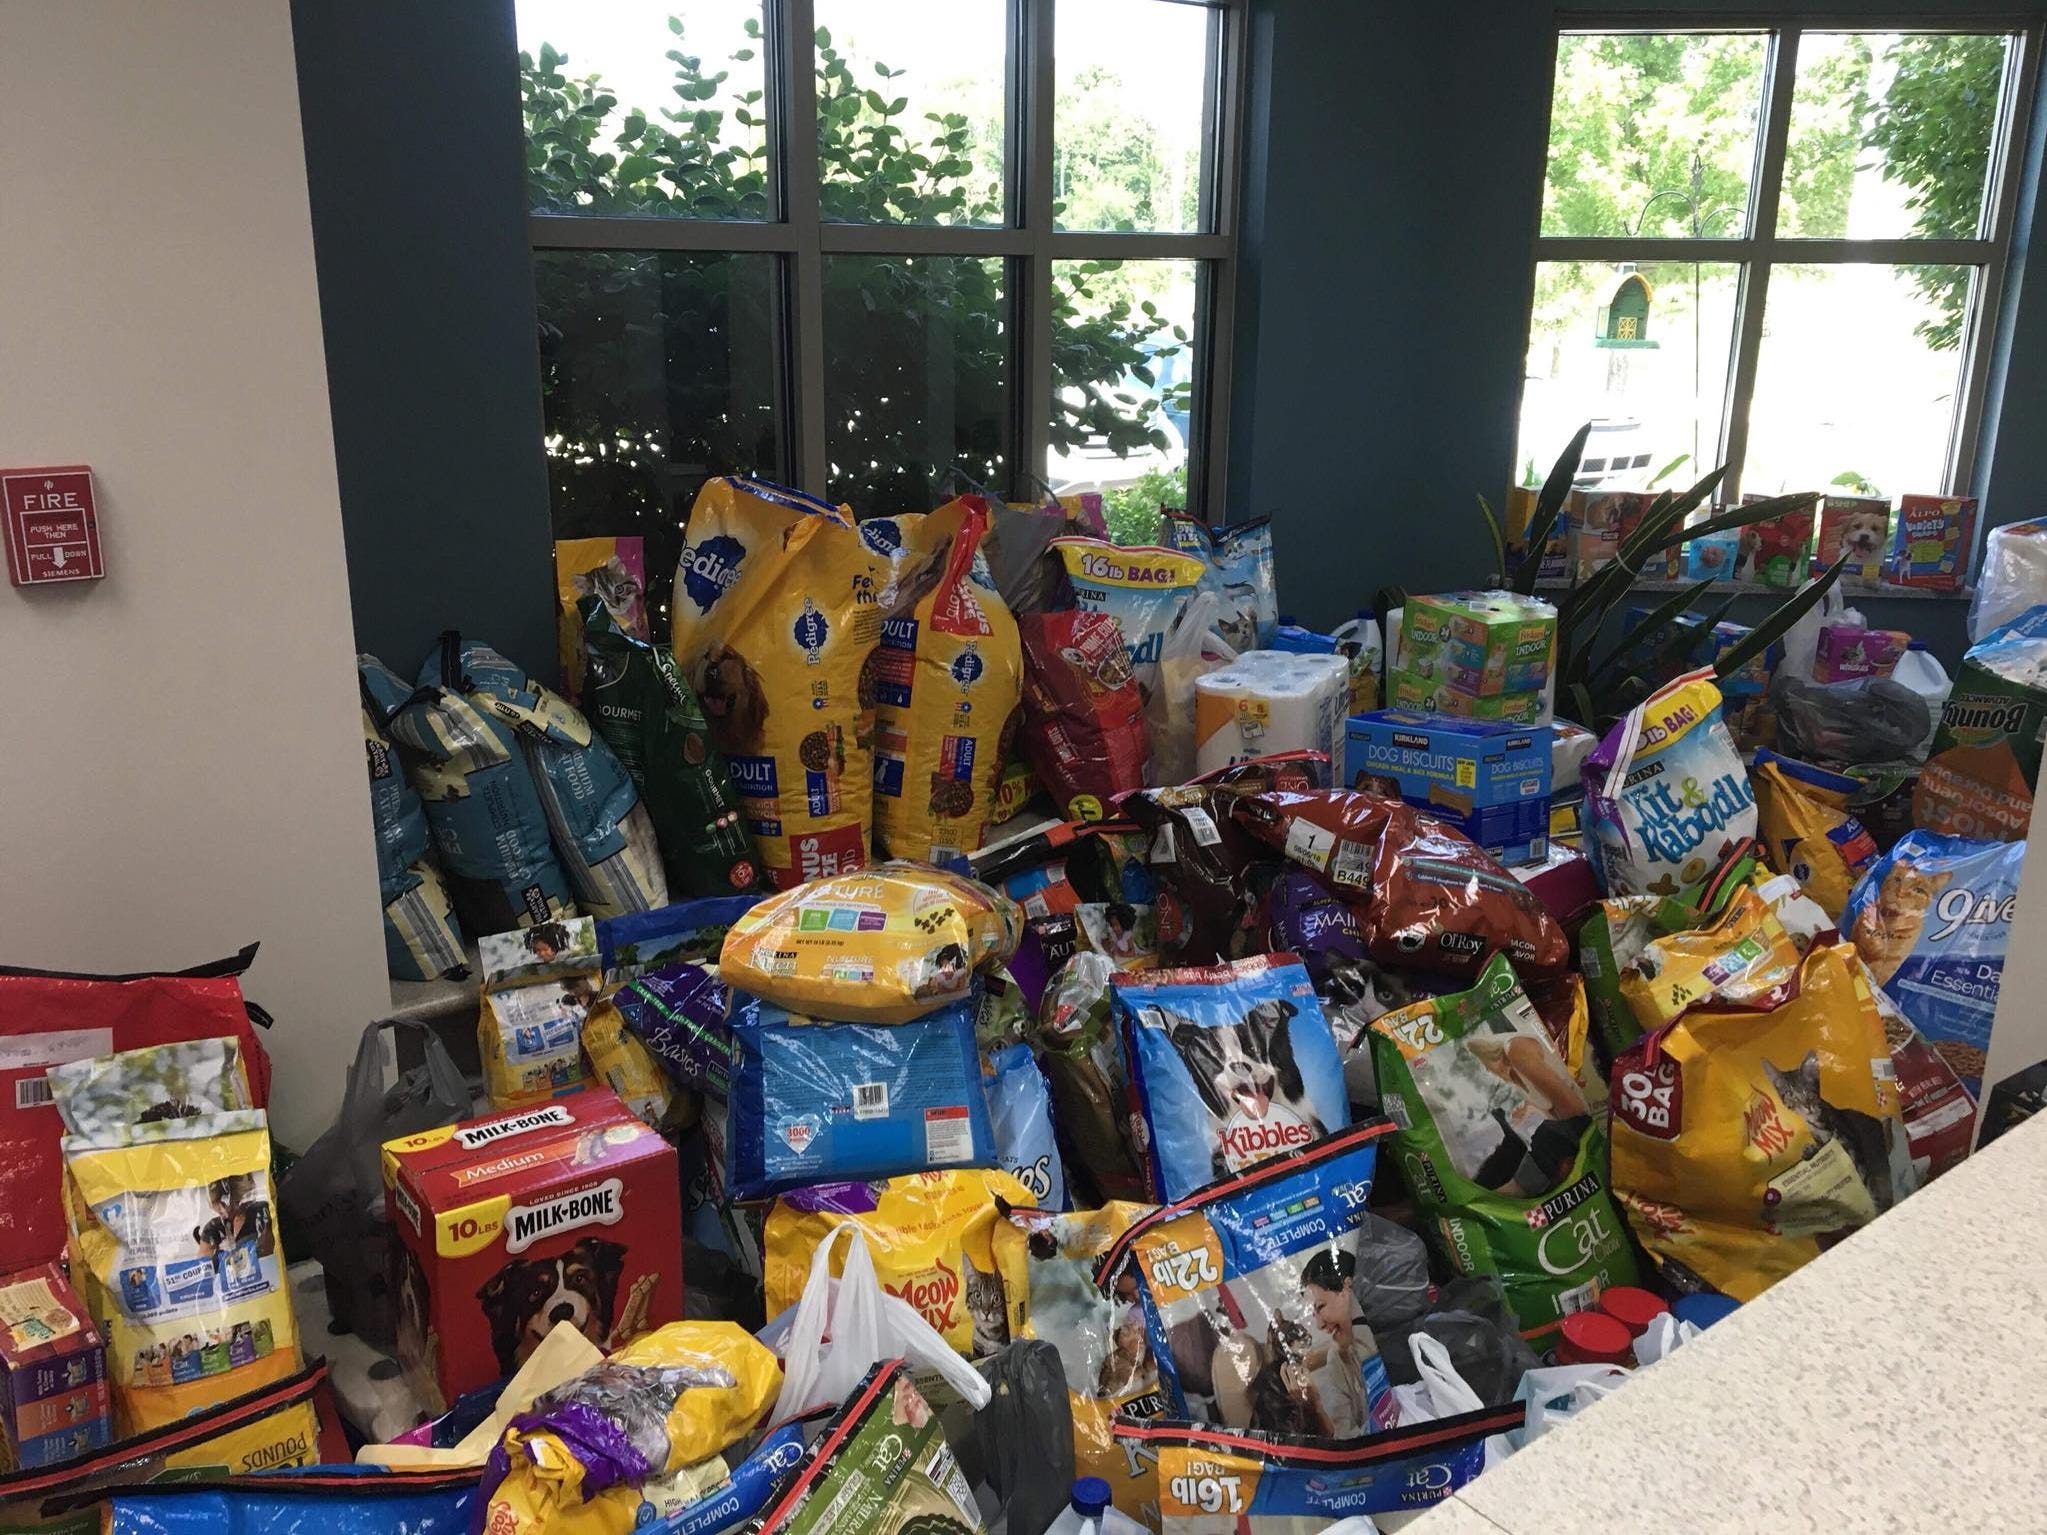 Donations to the lobby of Hendricks County Animal Shelter left little room to walk on Thursday.